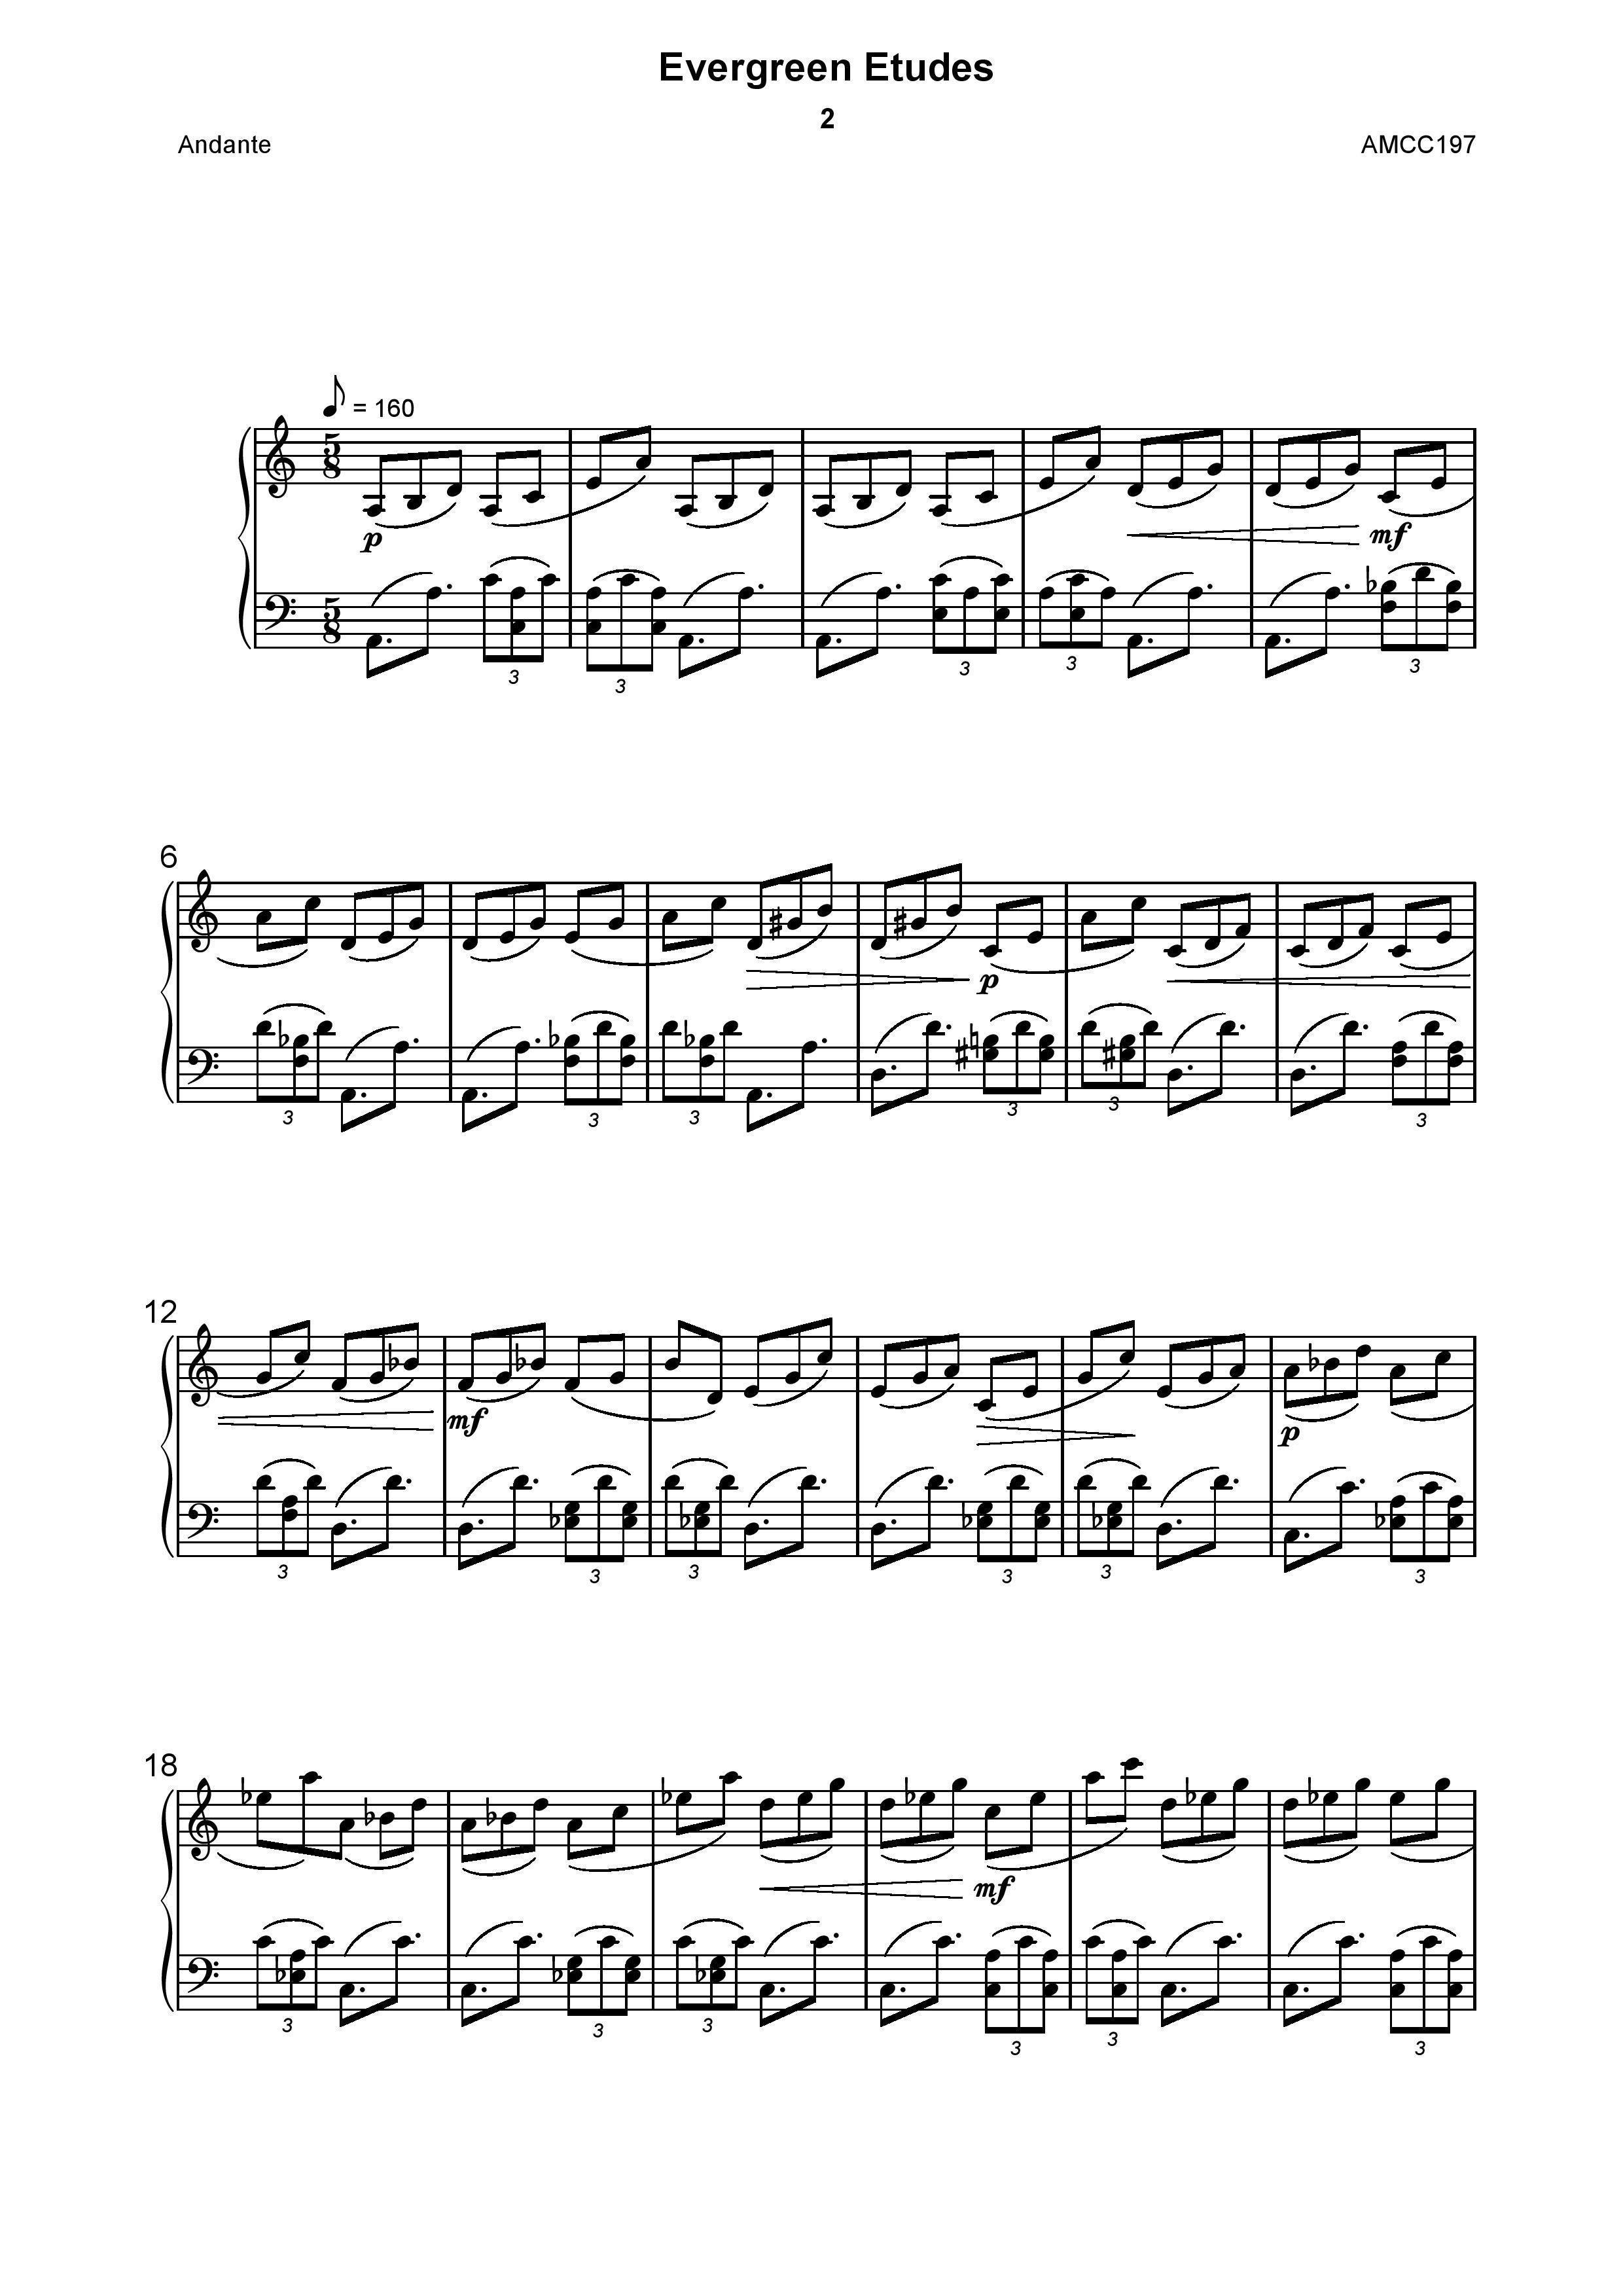 197 evergreenetude 2 page 001